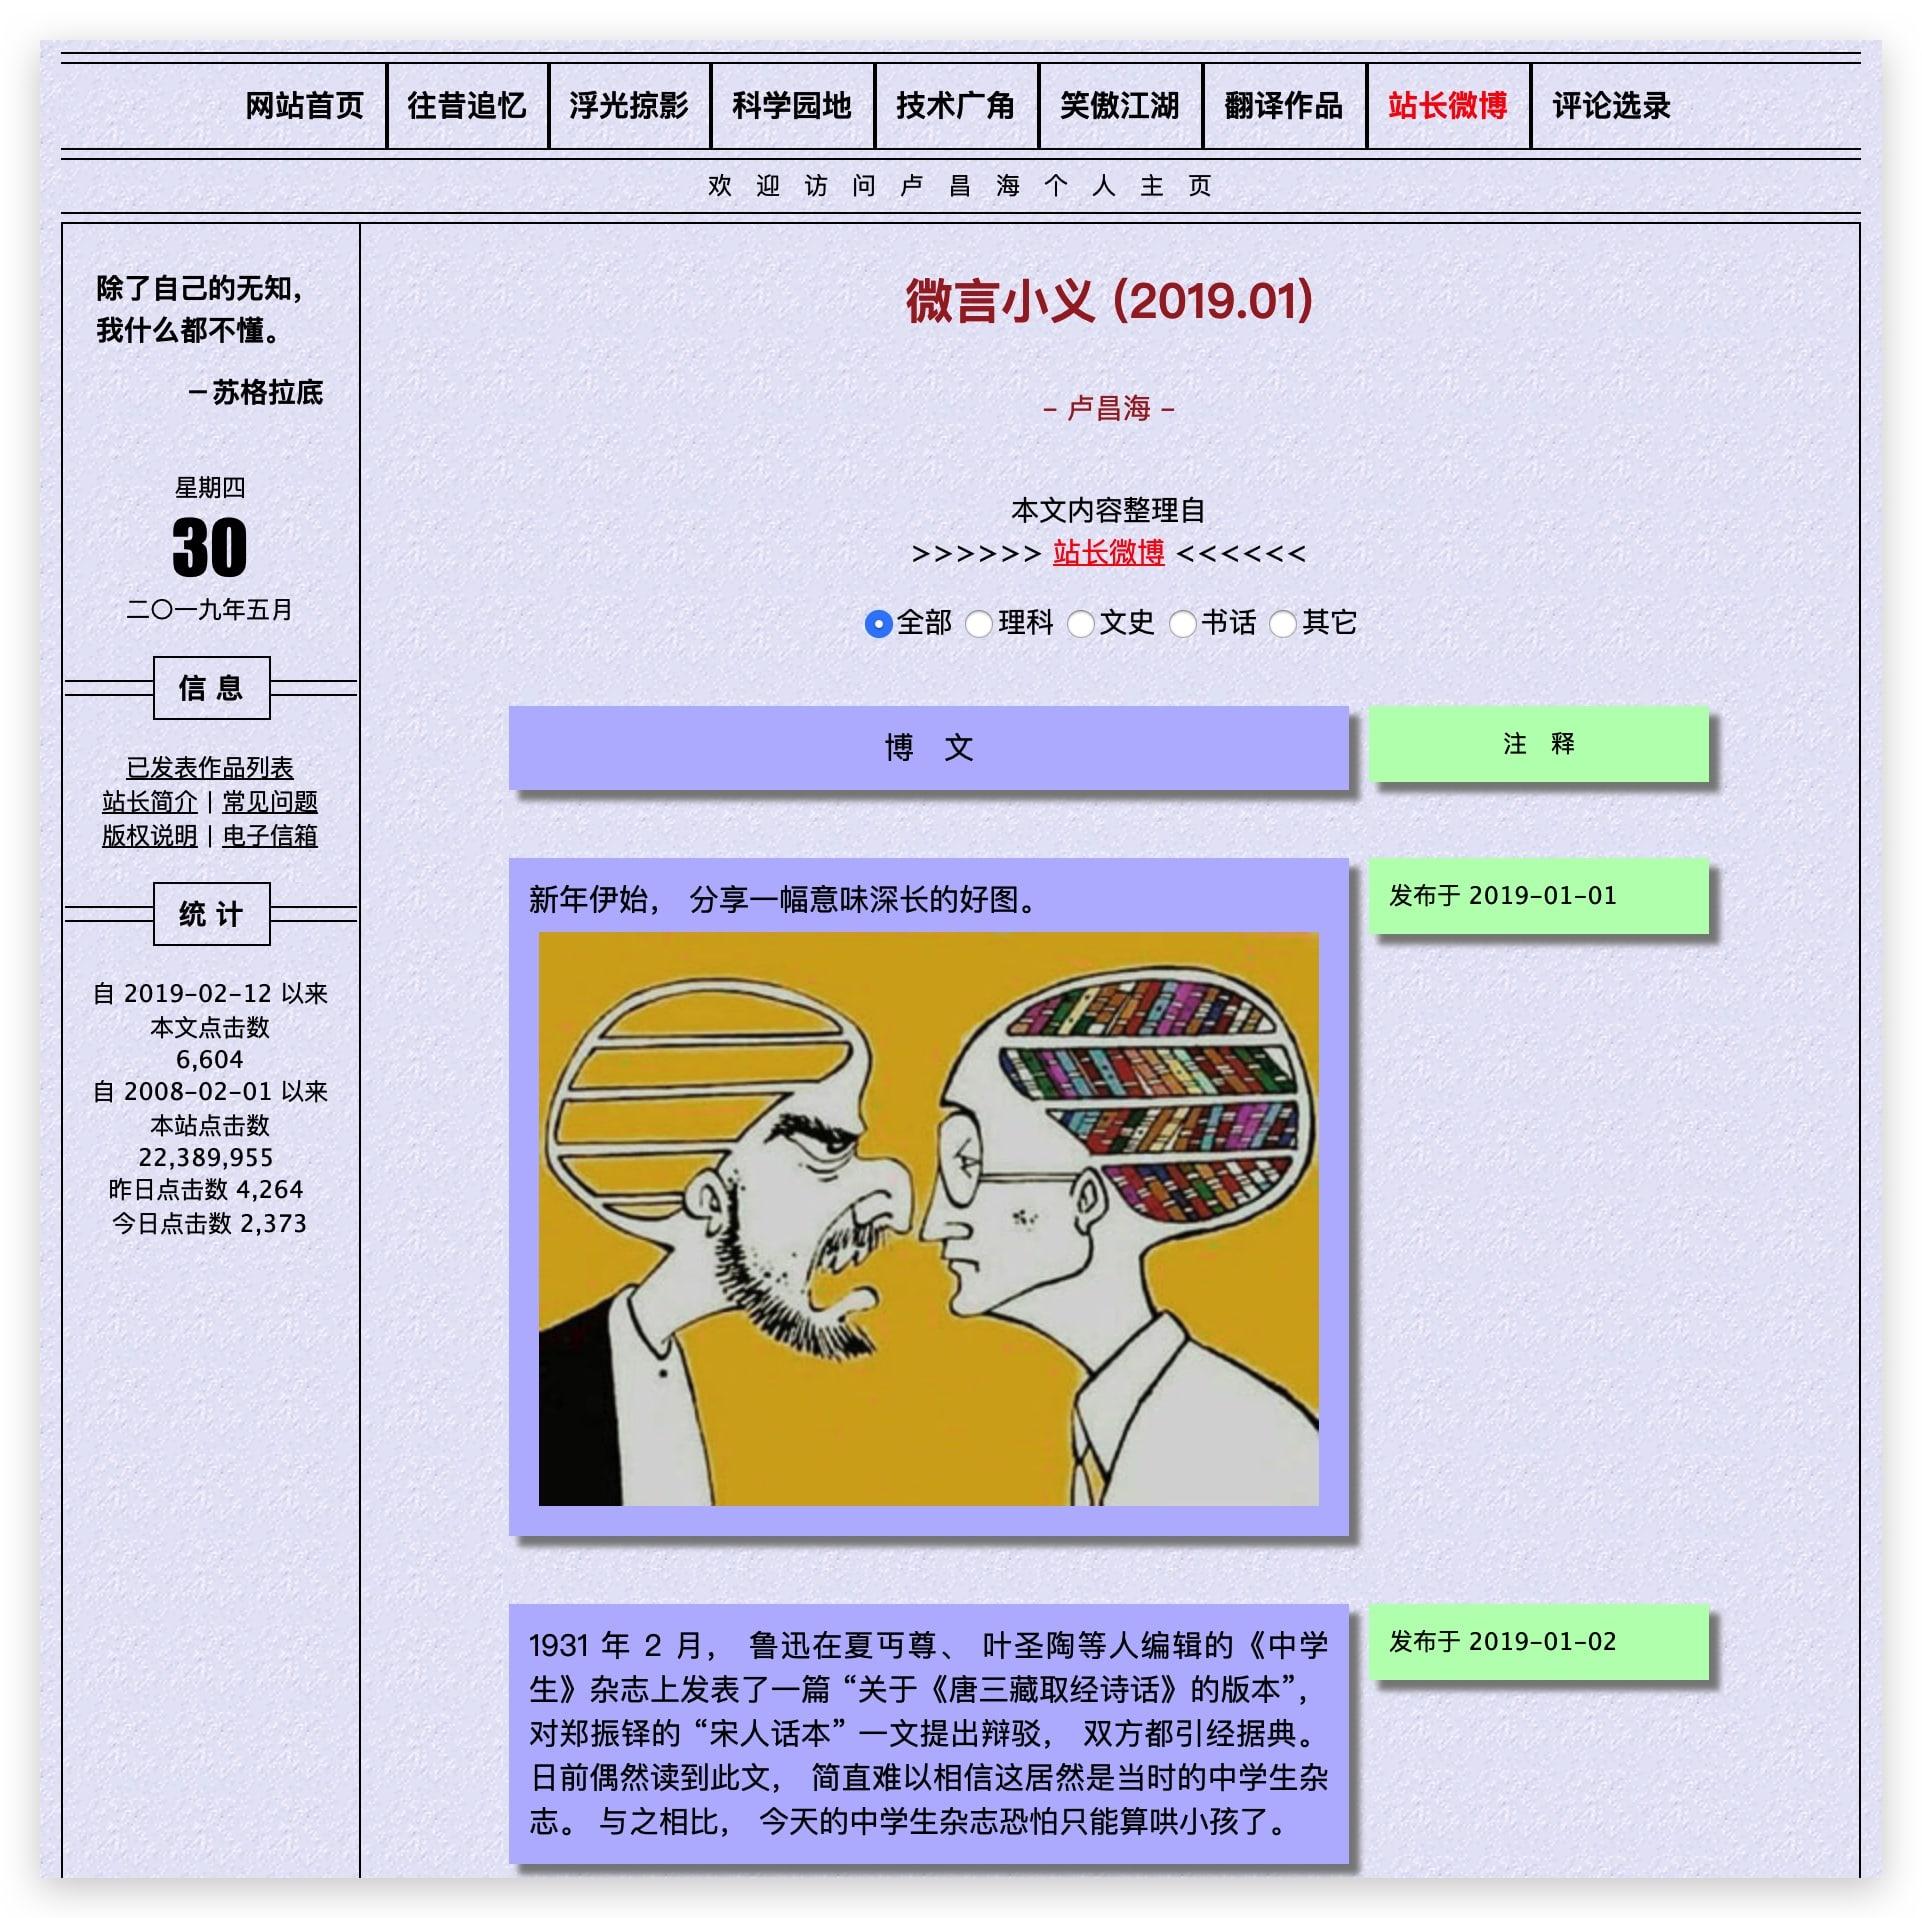 Xnip2019-05-30_02-00-33.jpg-510.2kB